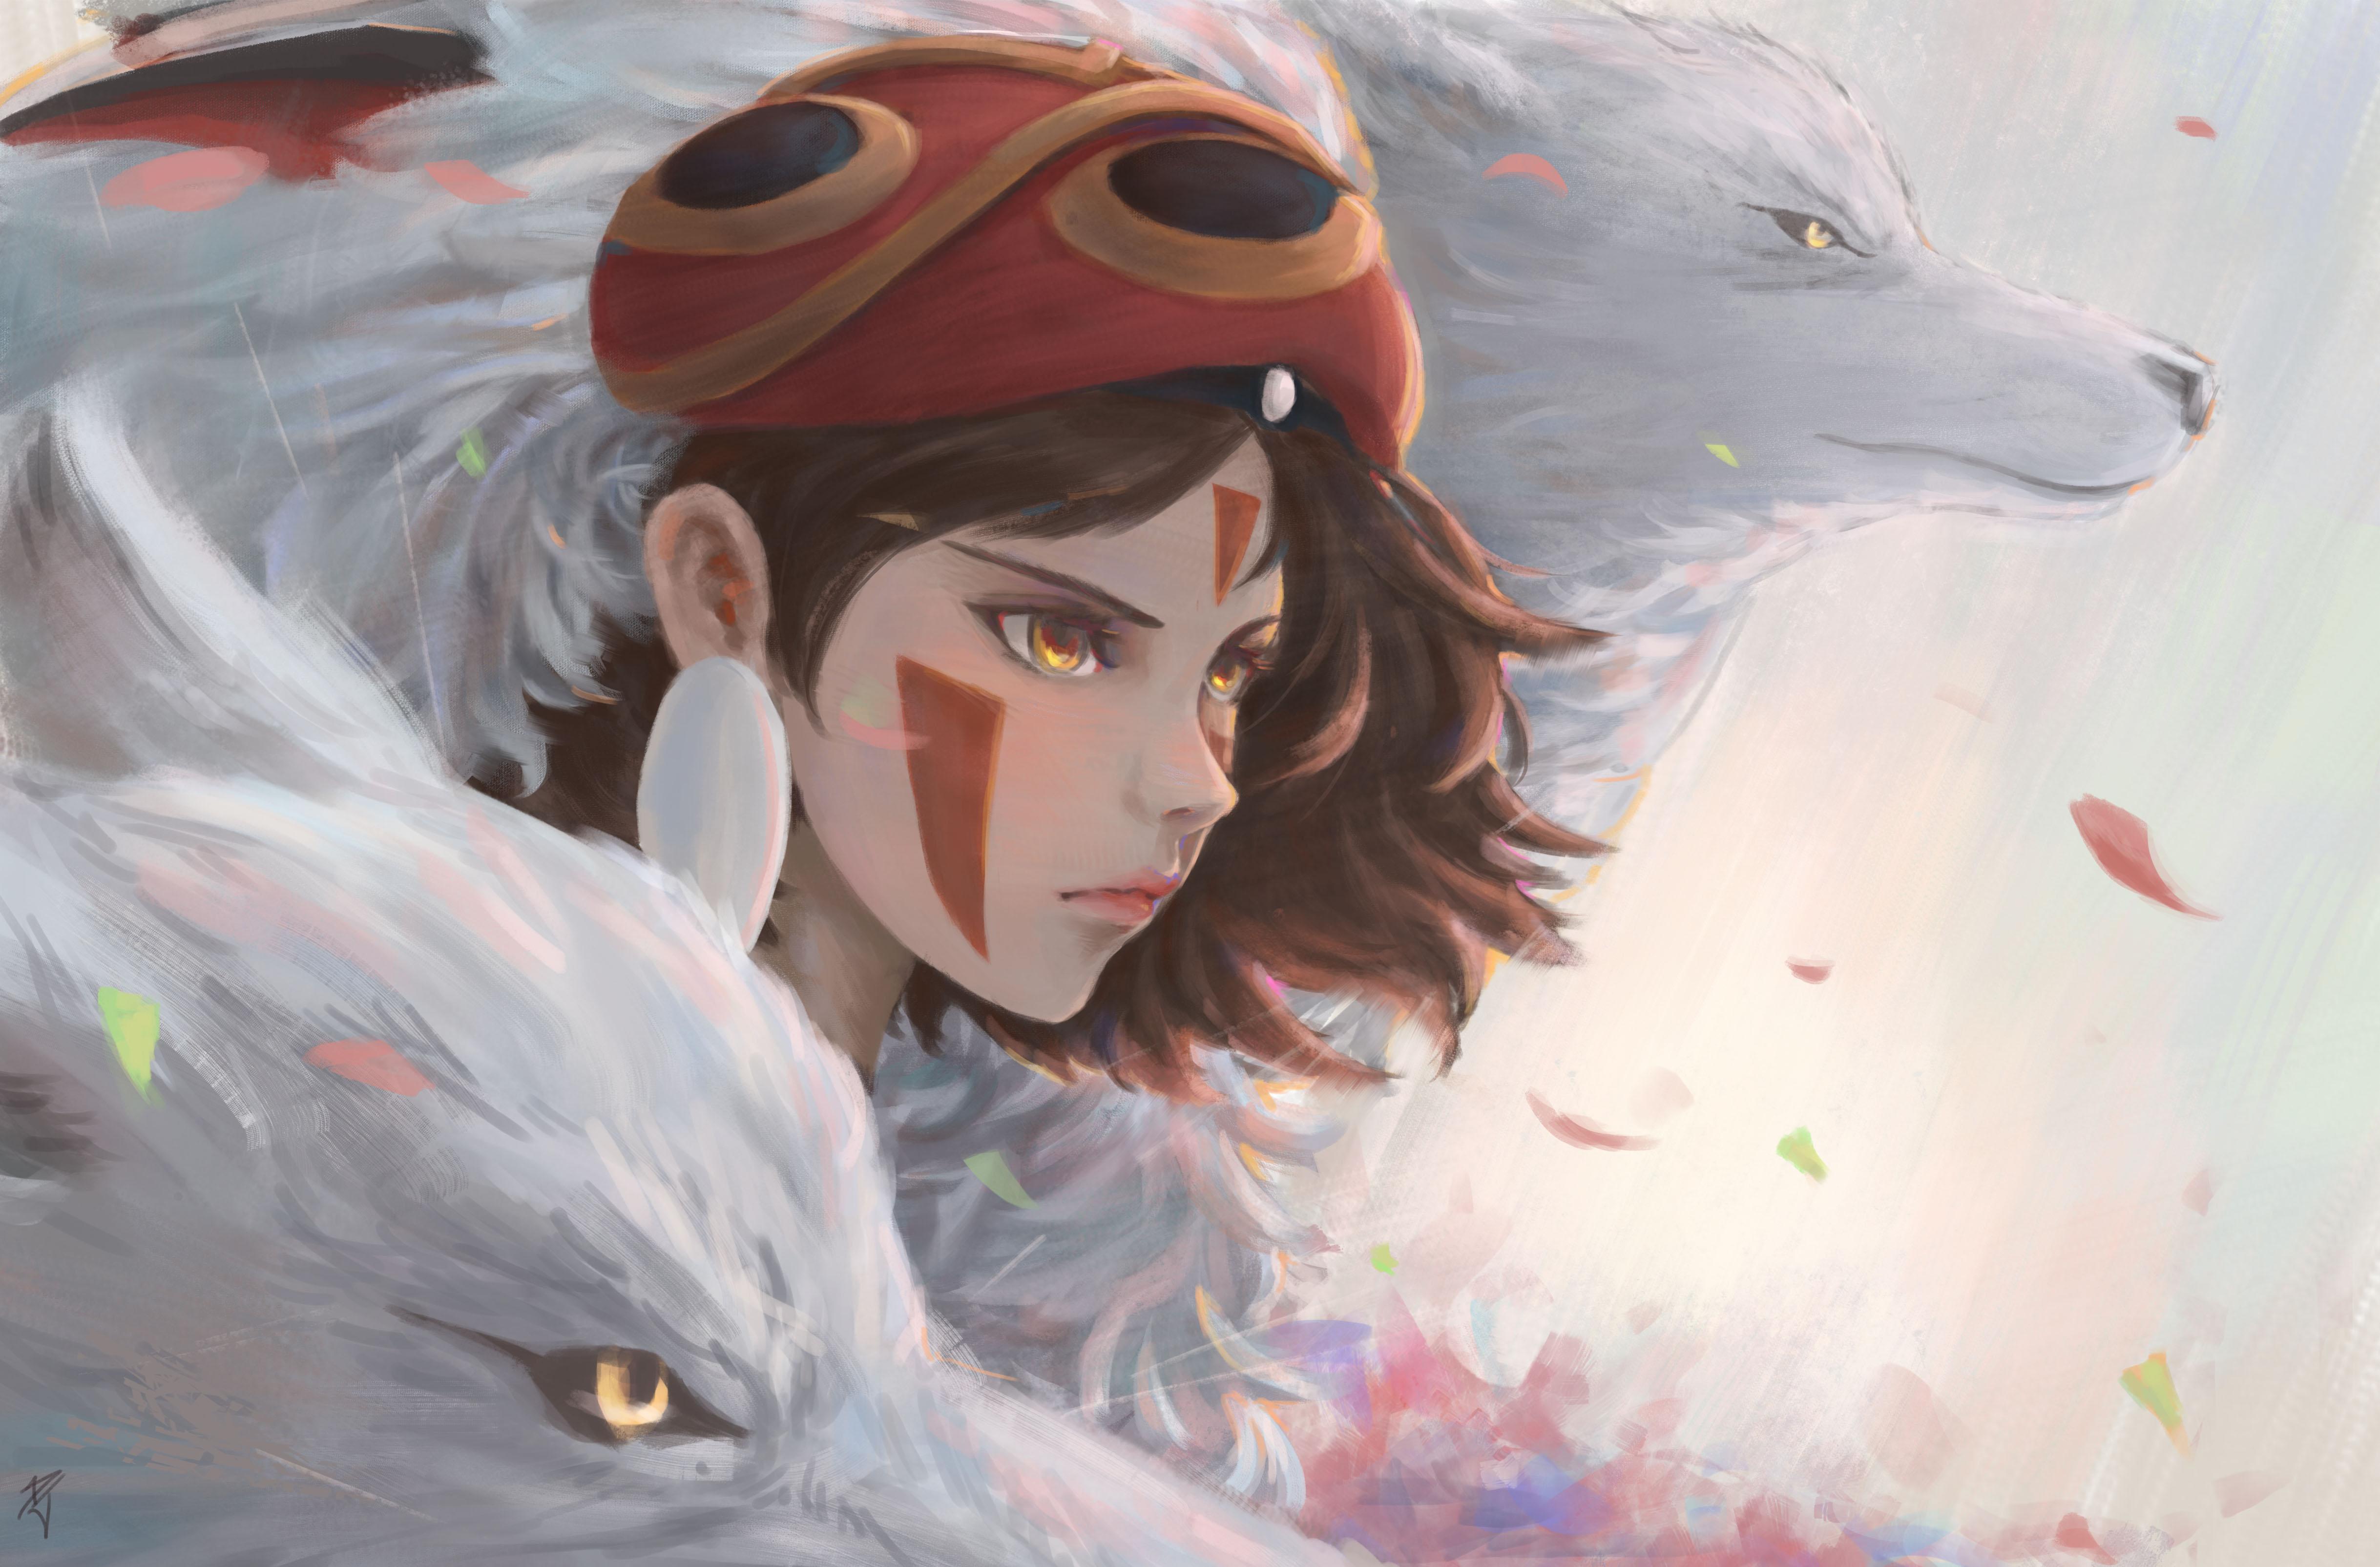 Princess mononoke 4k ultra hd wallpaper background image - Mononoke anime wallpaper ...